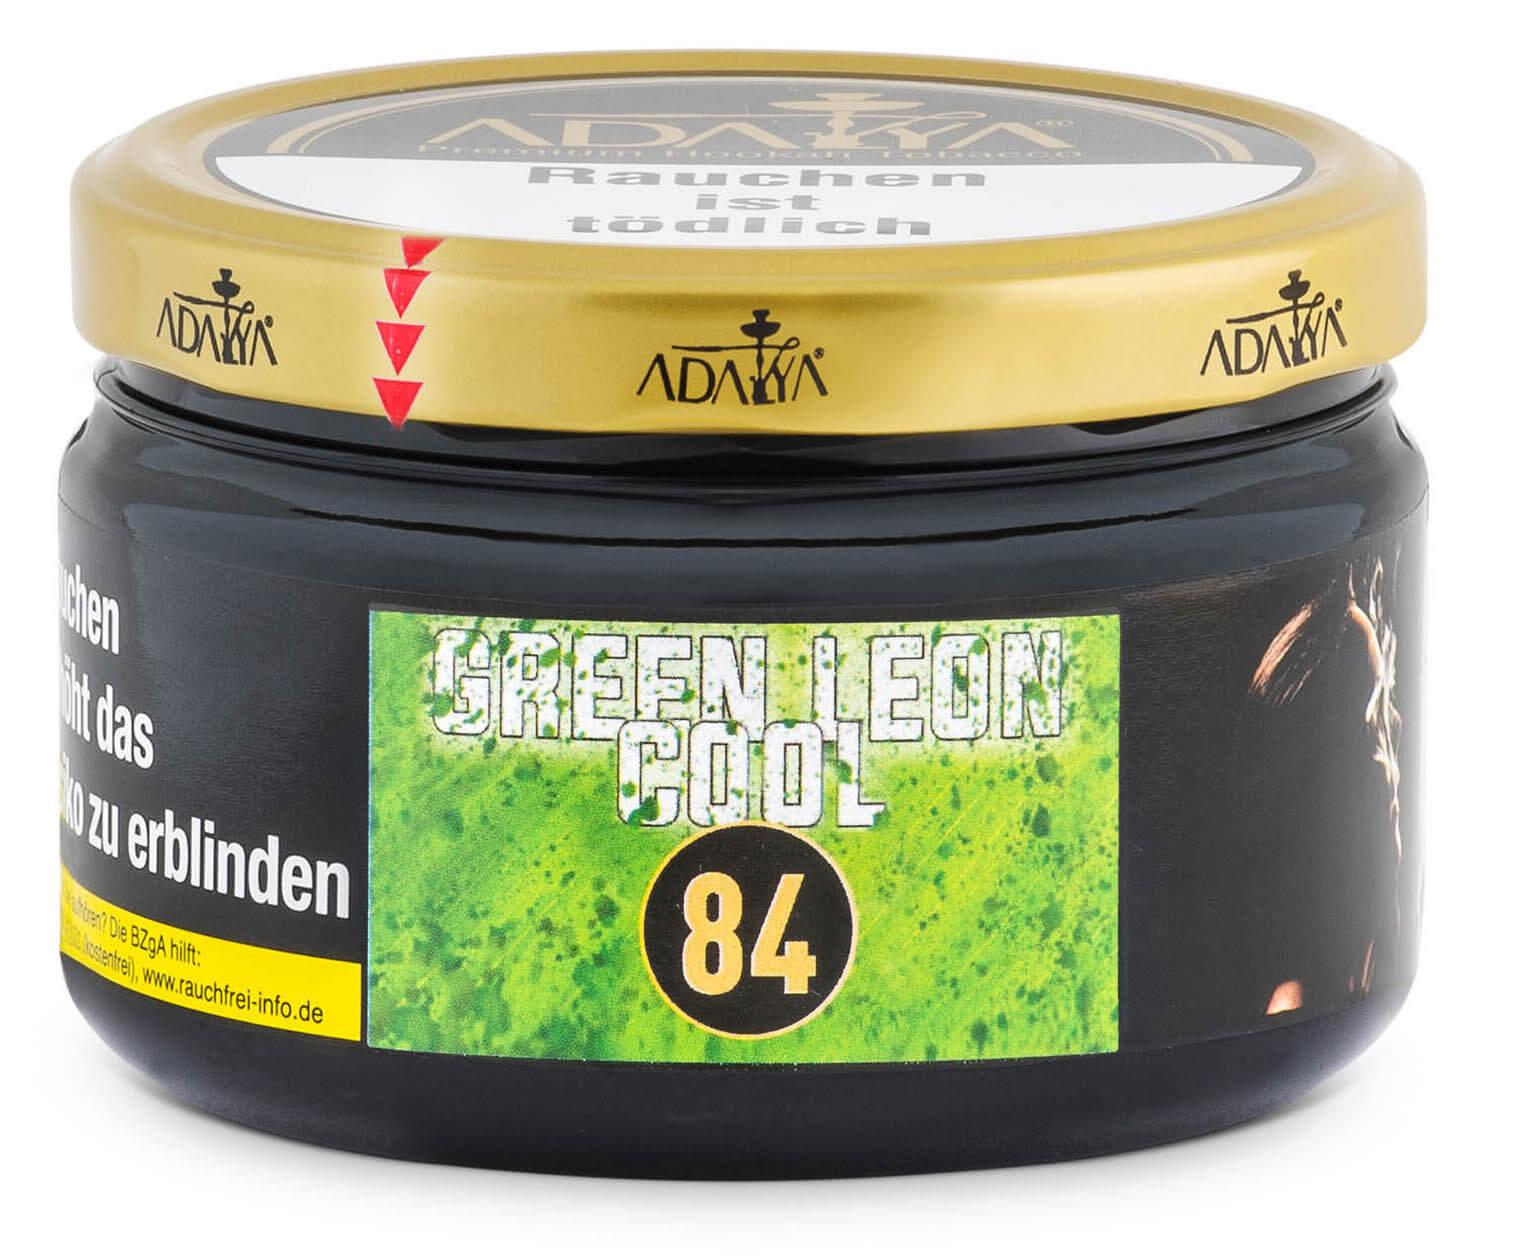 Adalya Tabak Green Leon Cool #84 200g